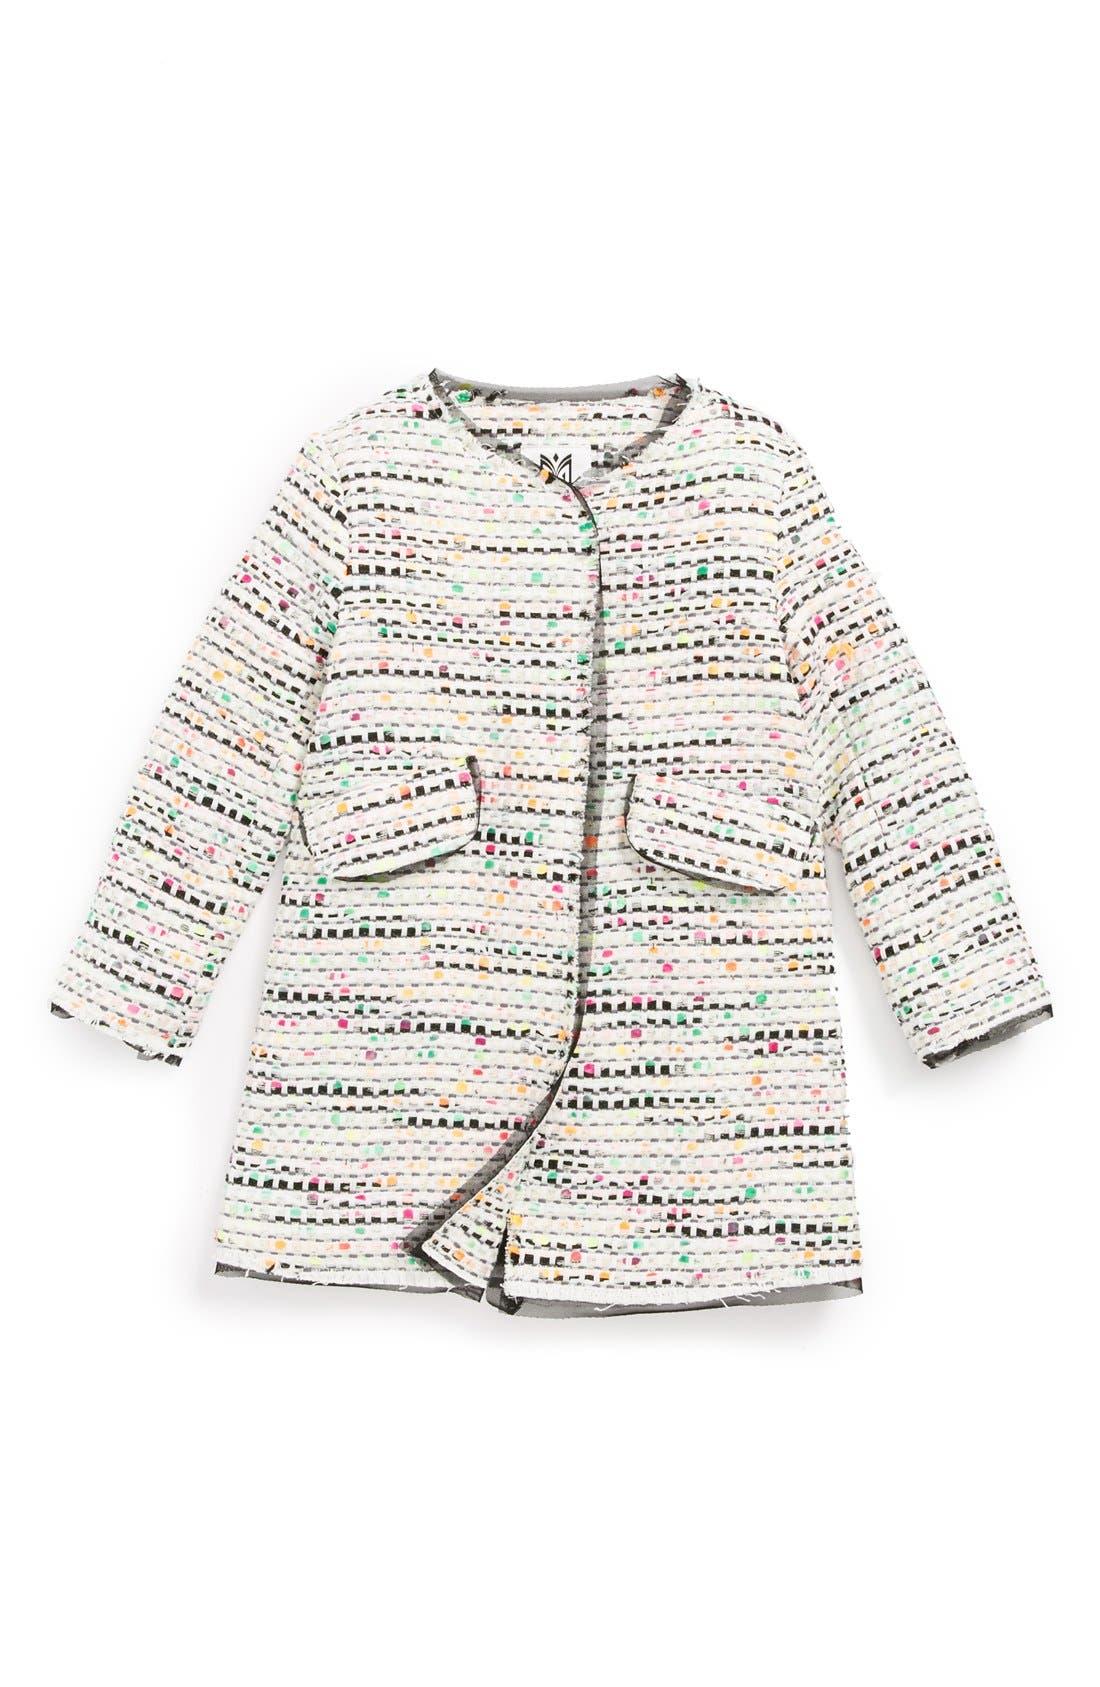 Alternate Image 1 Selected - Milly Minis 'Confetti' Tweed Coat (Toddler Girls, Little Girls & Big Girls)